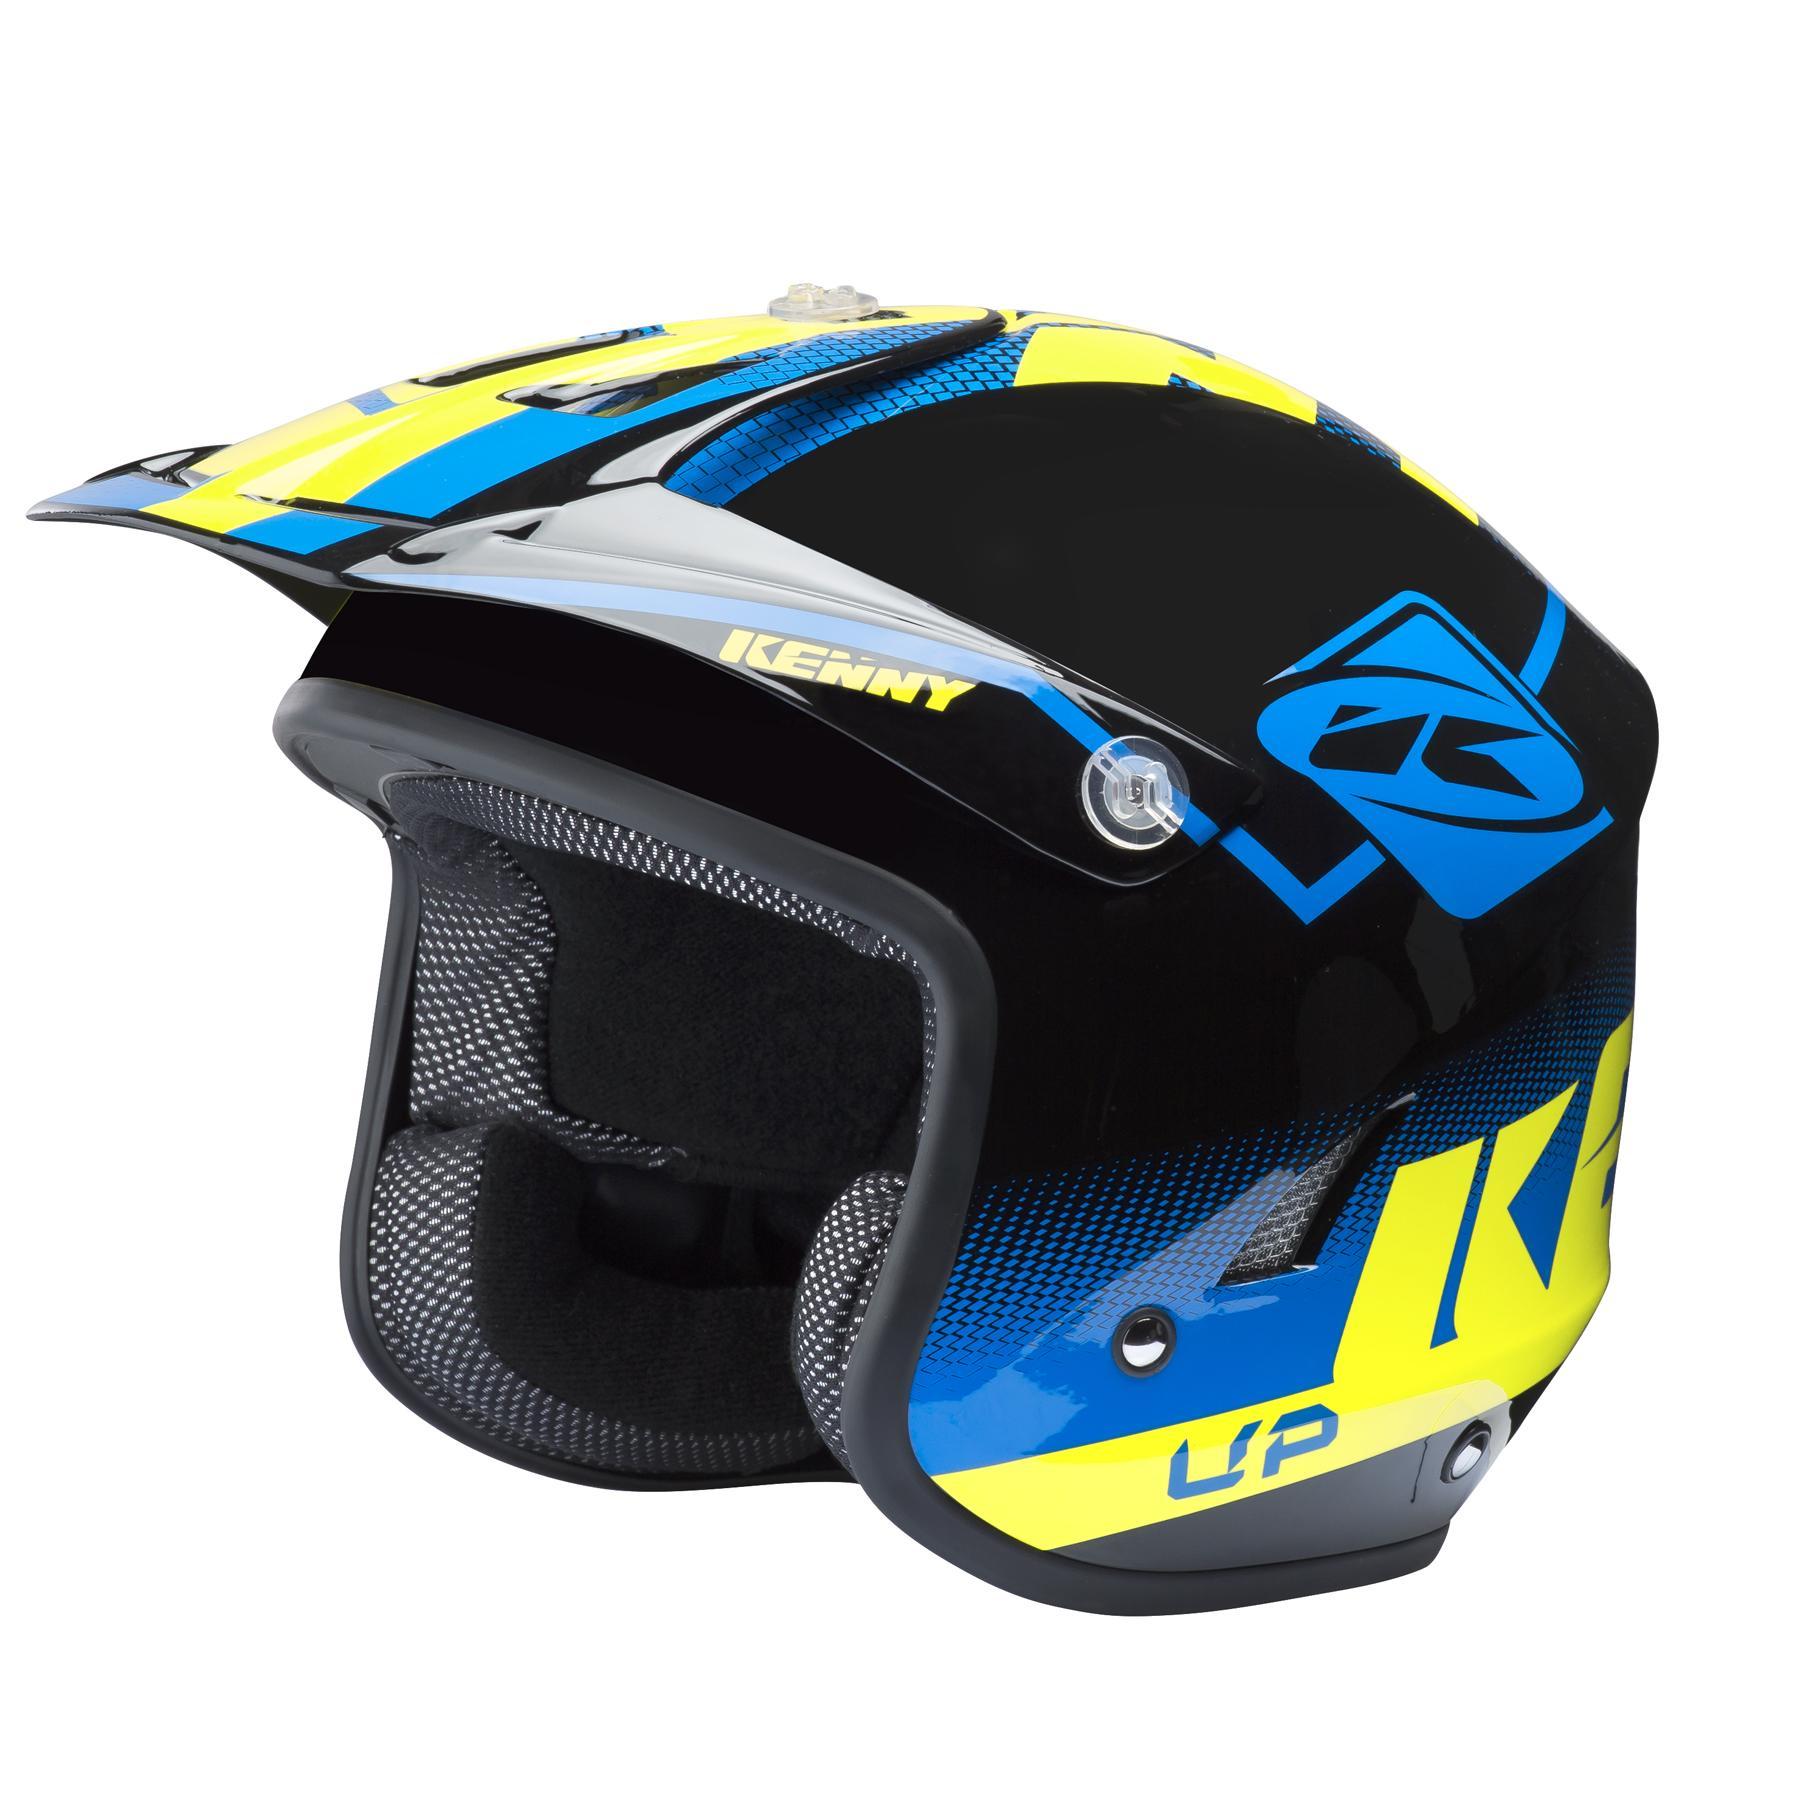 helmet trial up blue neon yellow kenny racing